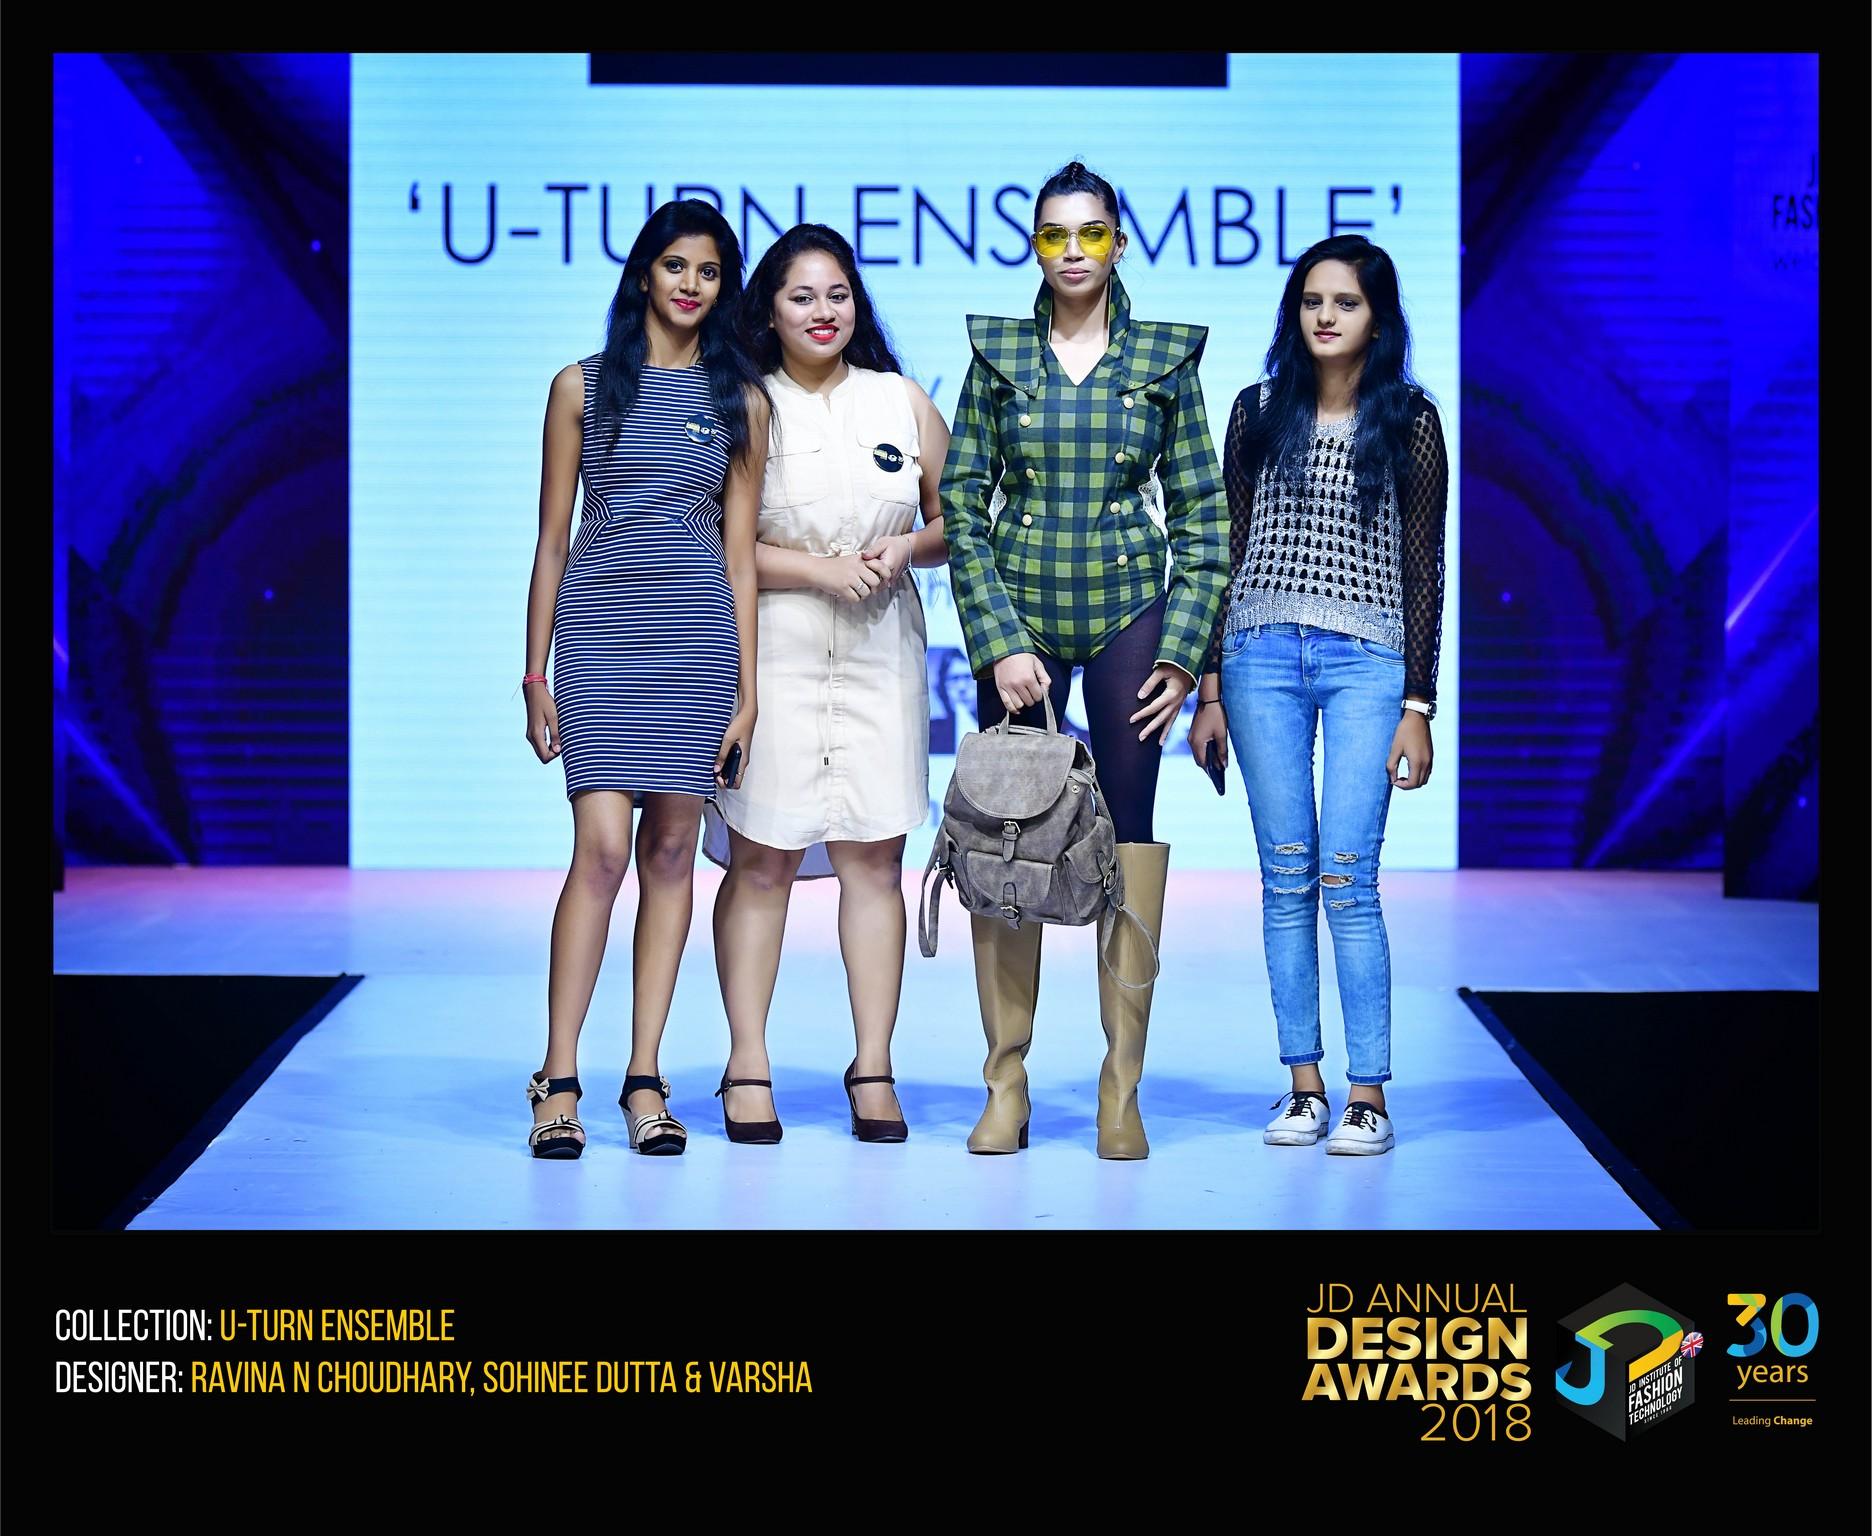 The U-turn ensemble – Change – JD Annual Design Awards 2018 | Designer: Sohinee, Ravina and Varsha | Photography : Jerin Nath (@jerin_nath) the u-turn ensemble – change – jd annual design awards 2018 The U-turn ensemble – Change – JD Annual Design Awards 2018 U TURN ENSEMBLE 7